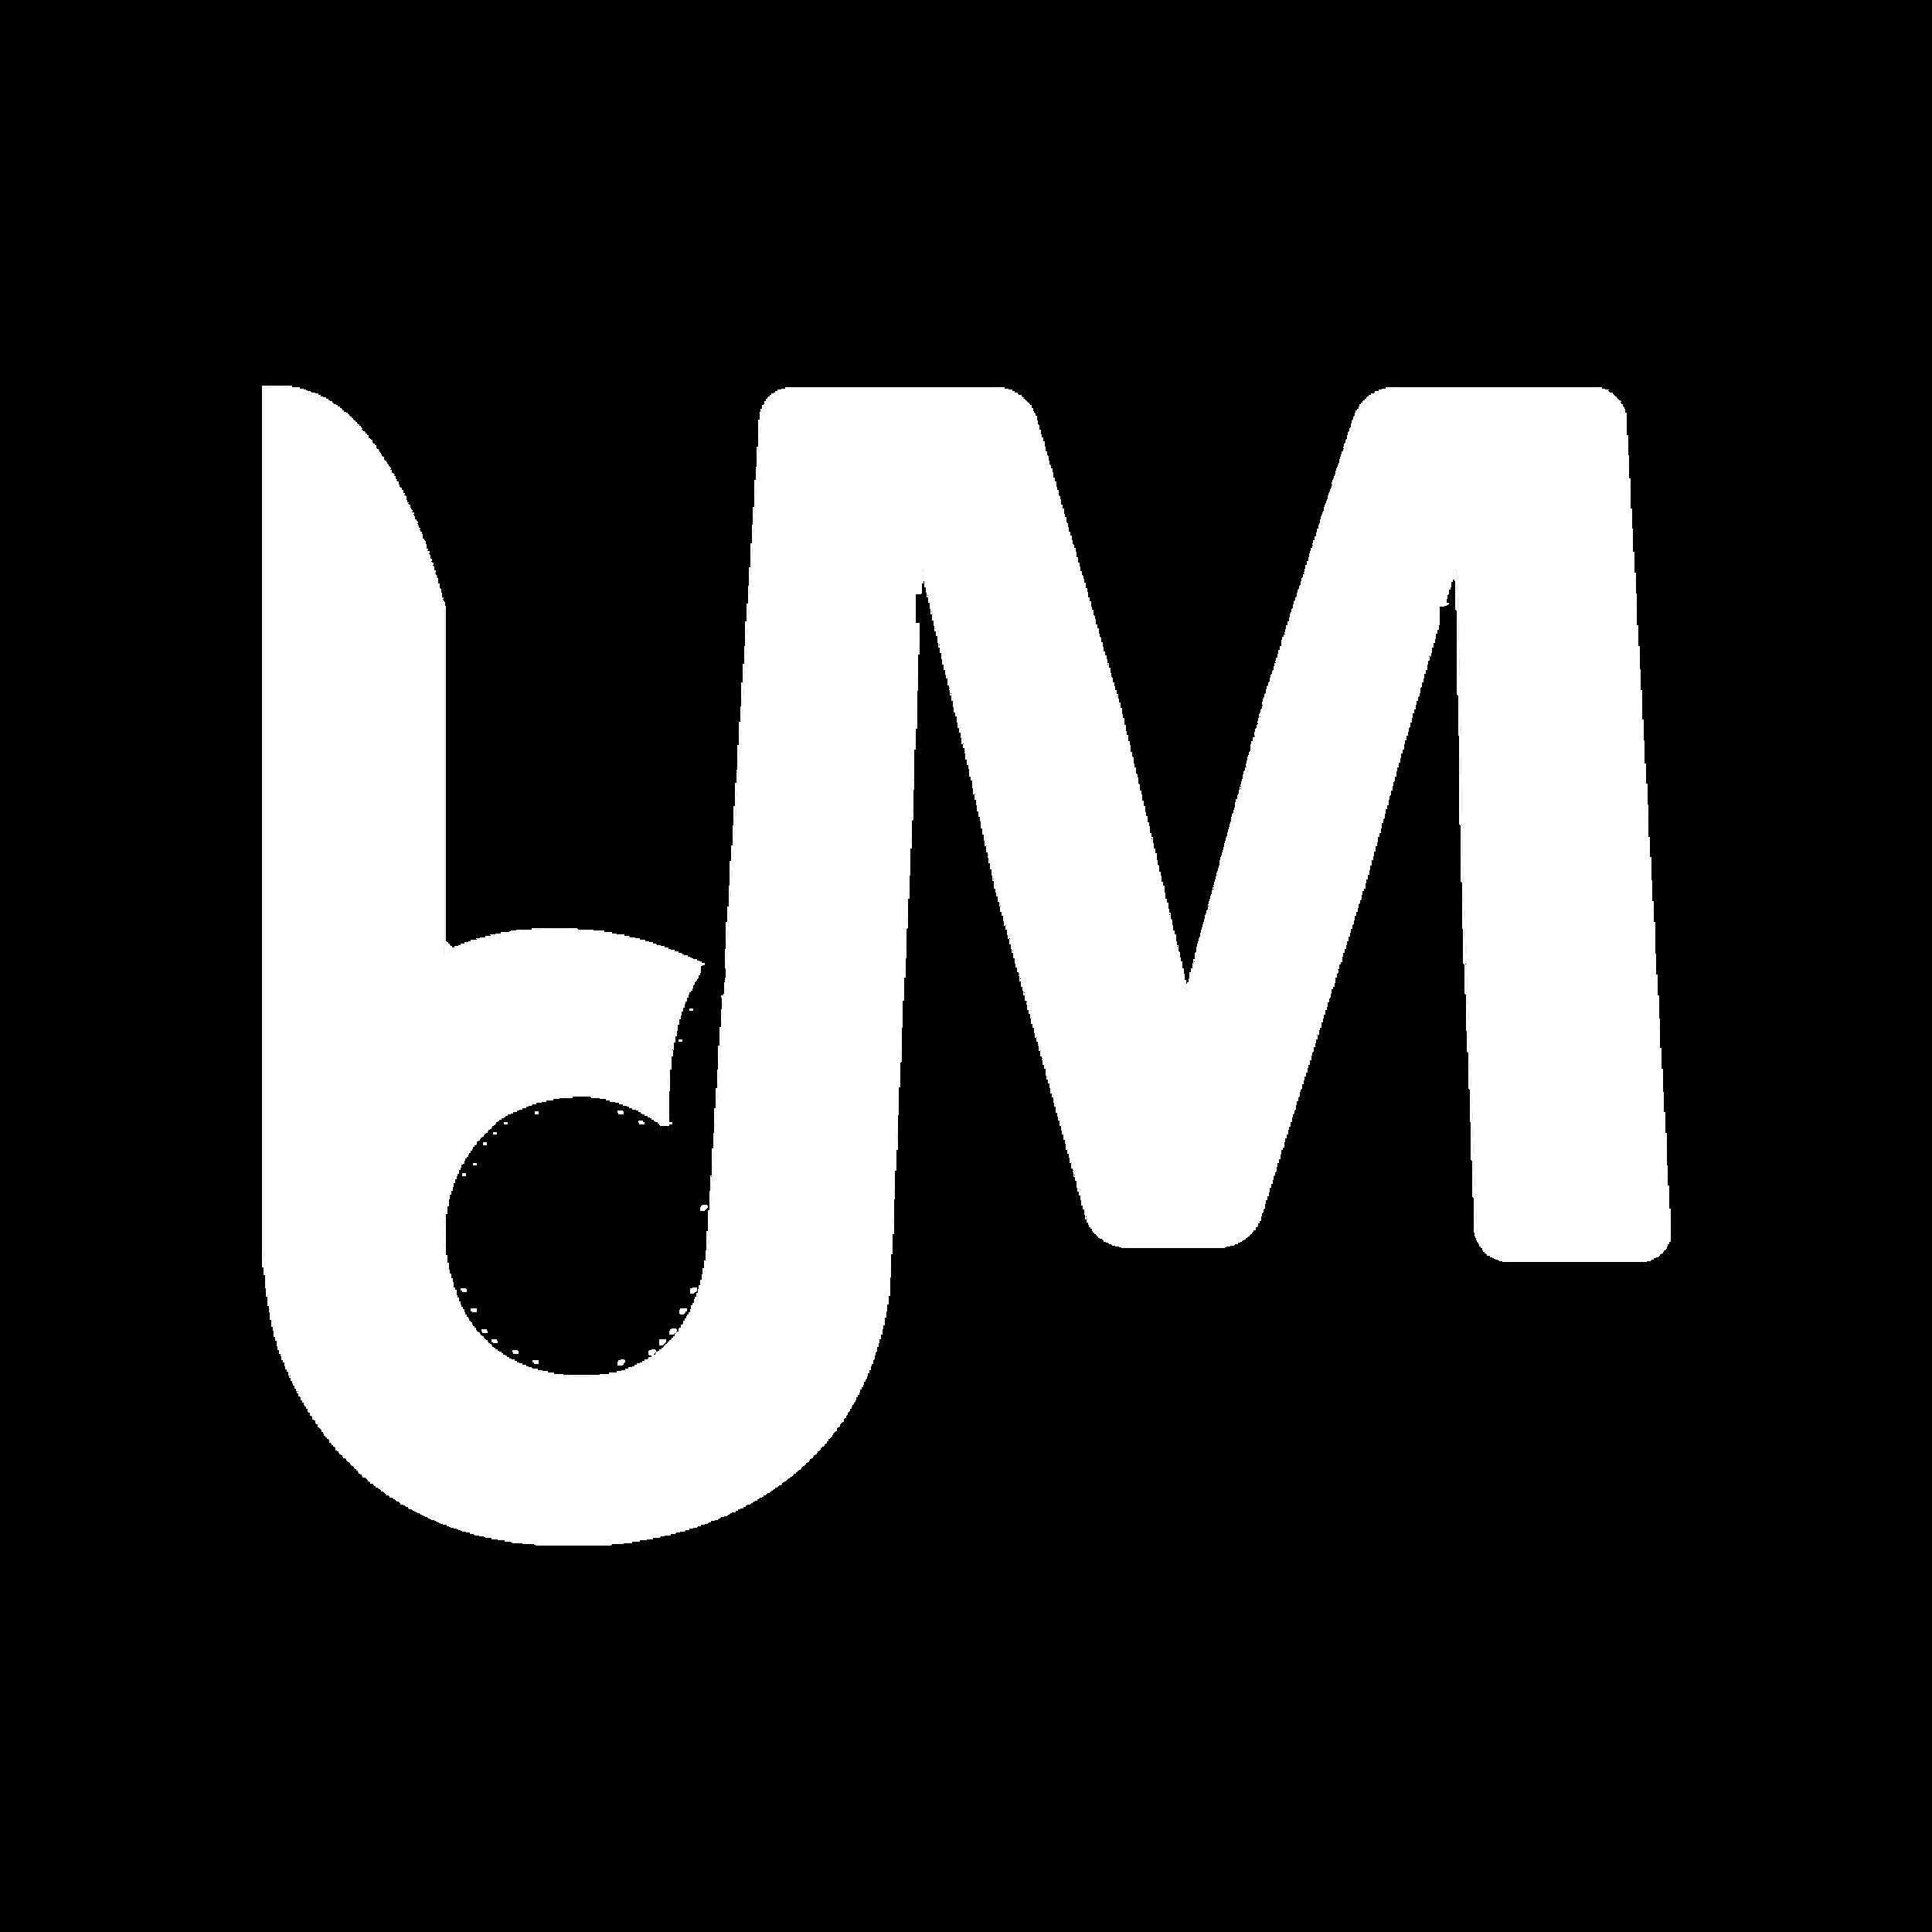 bMtransparent - whitenoedge_edited-1.png